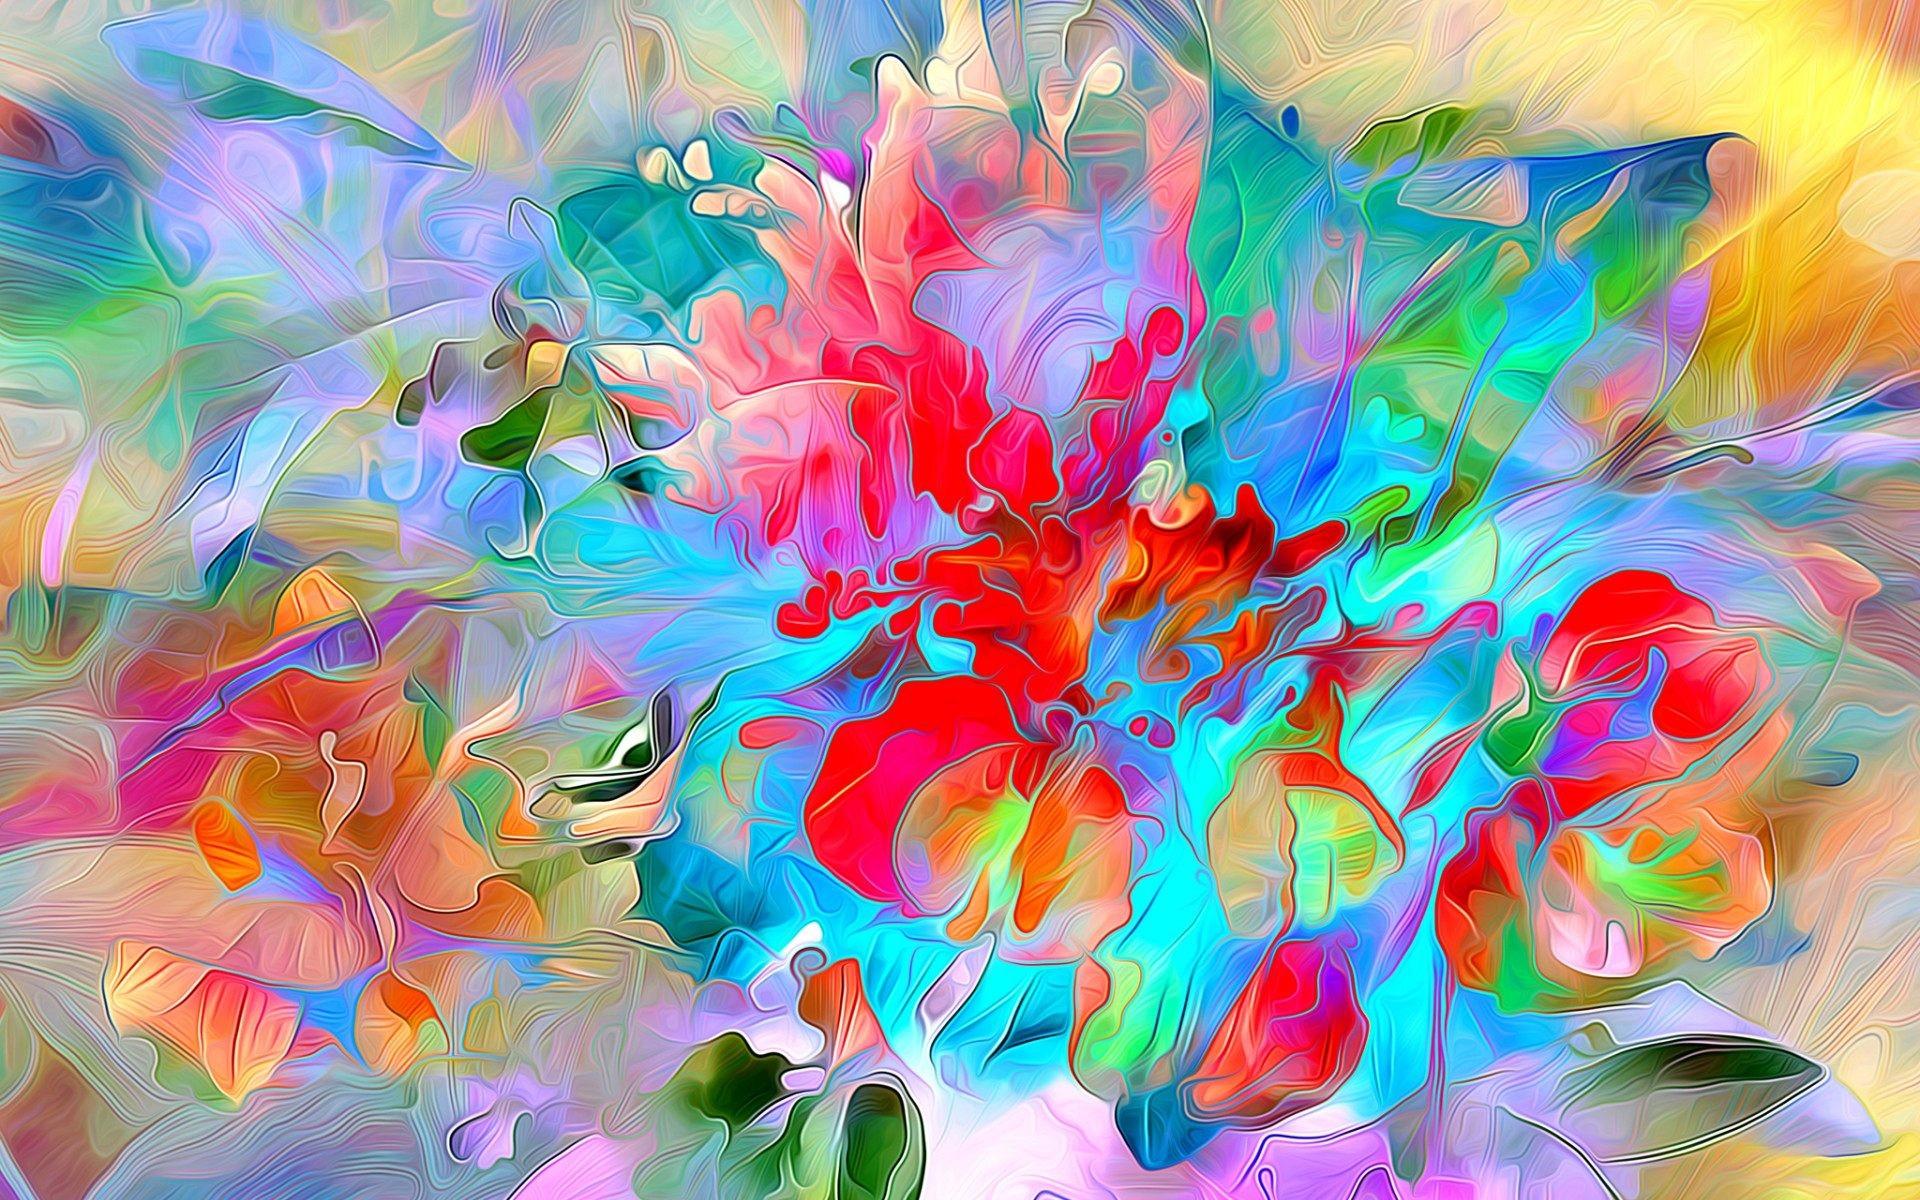 Color Explosion Wallpaper (77+ Images